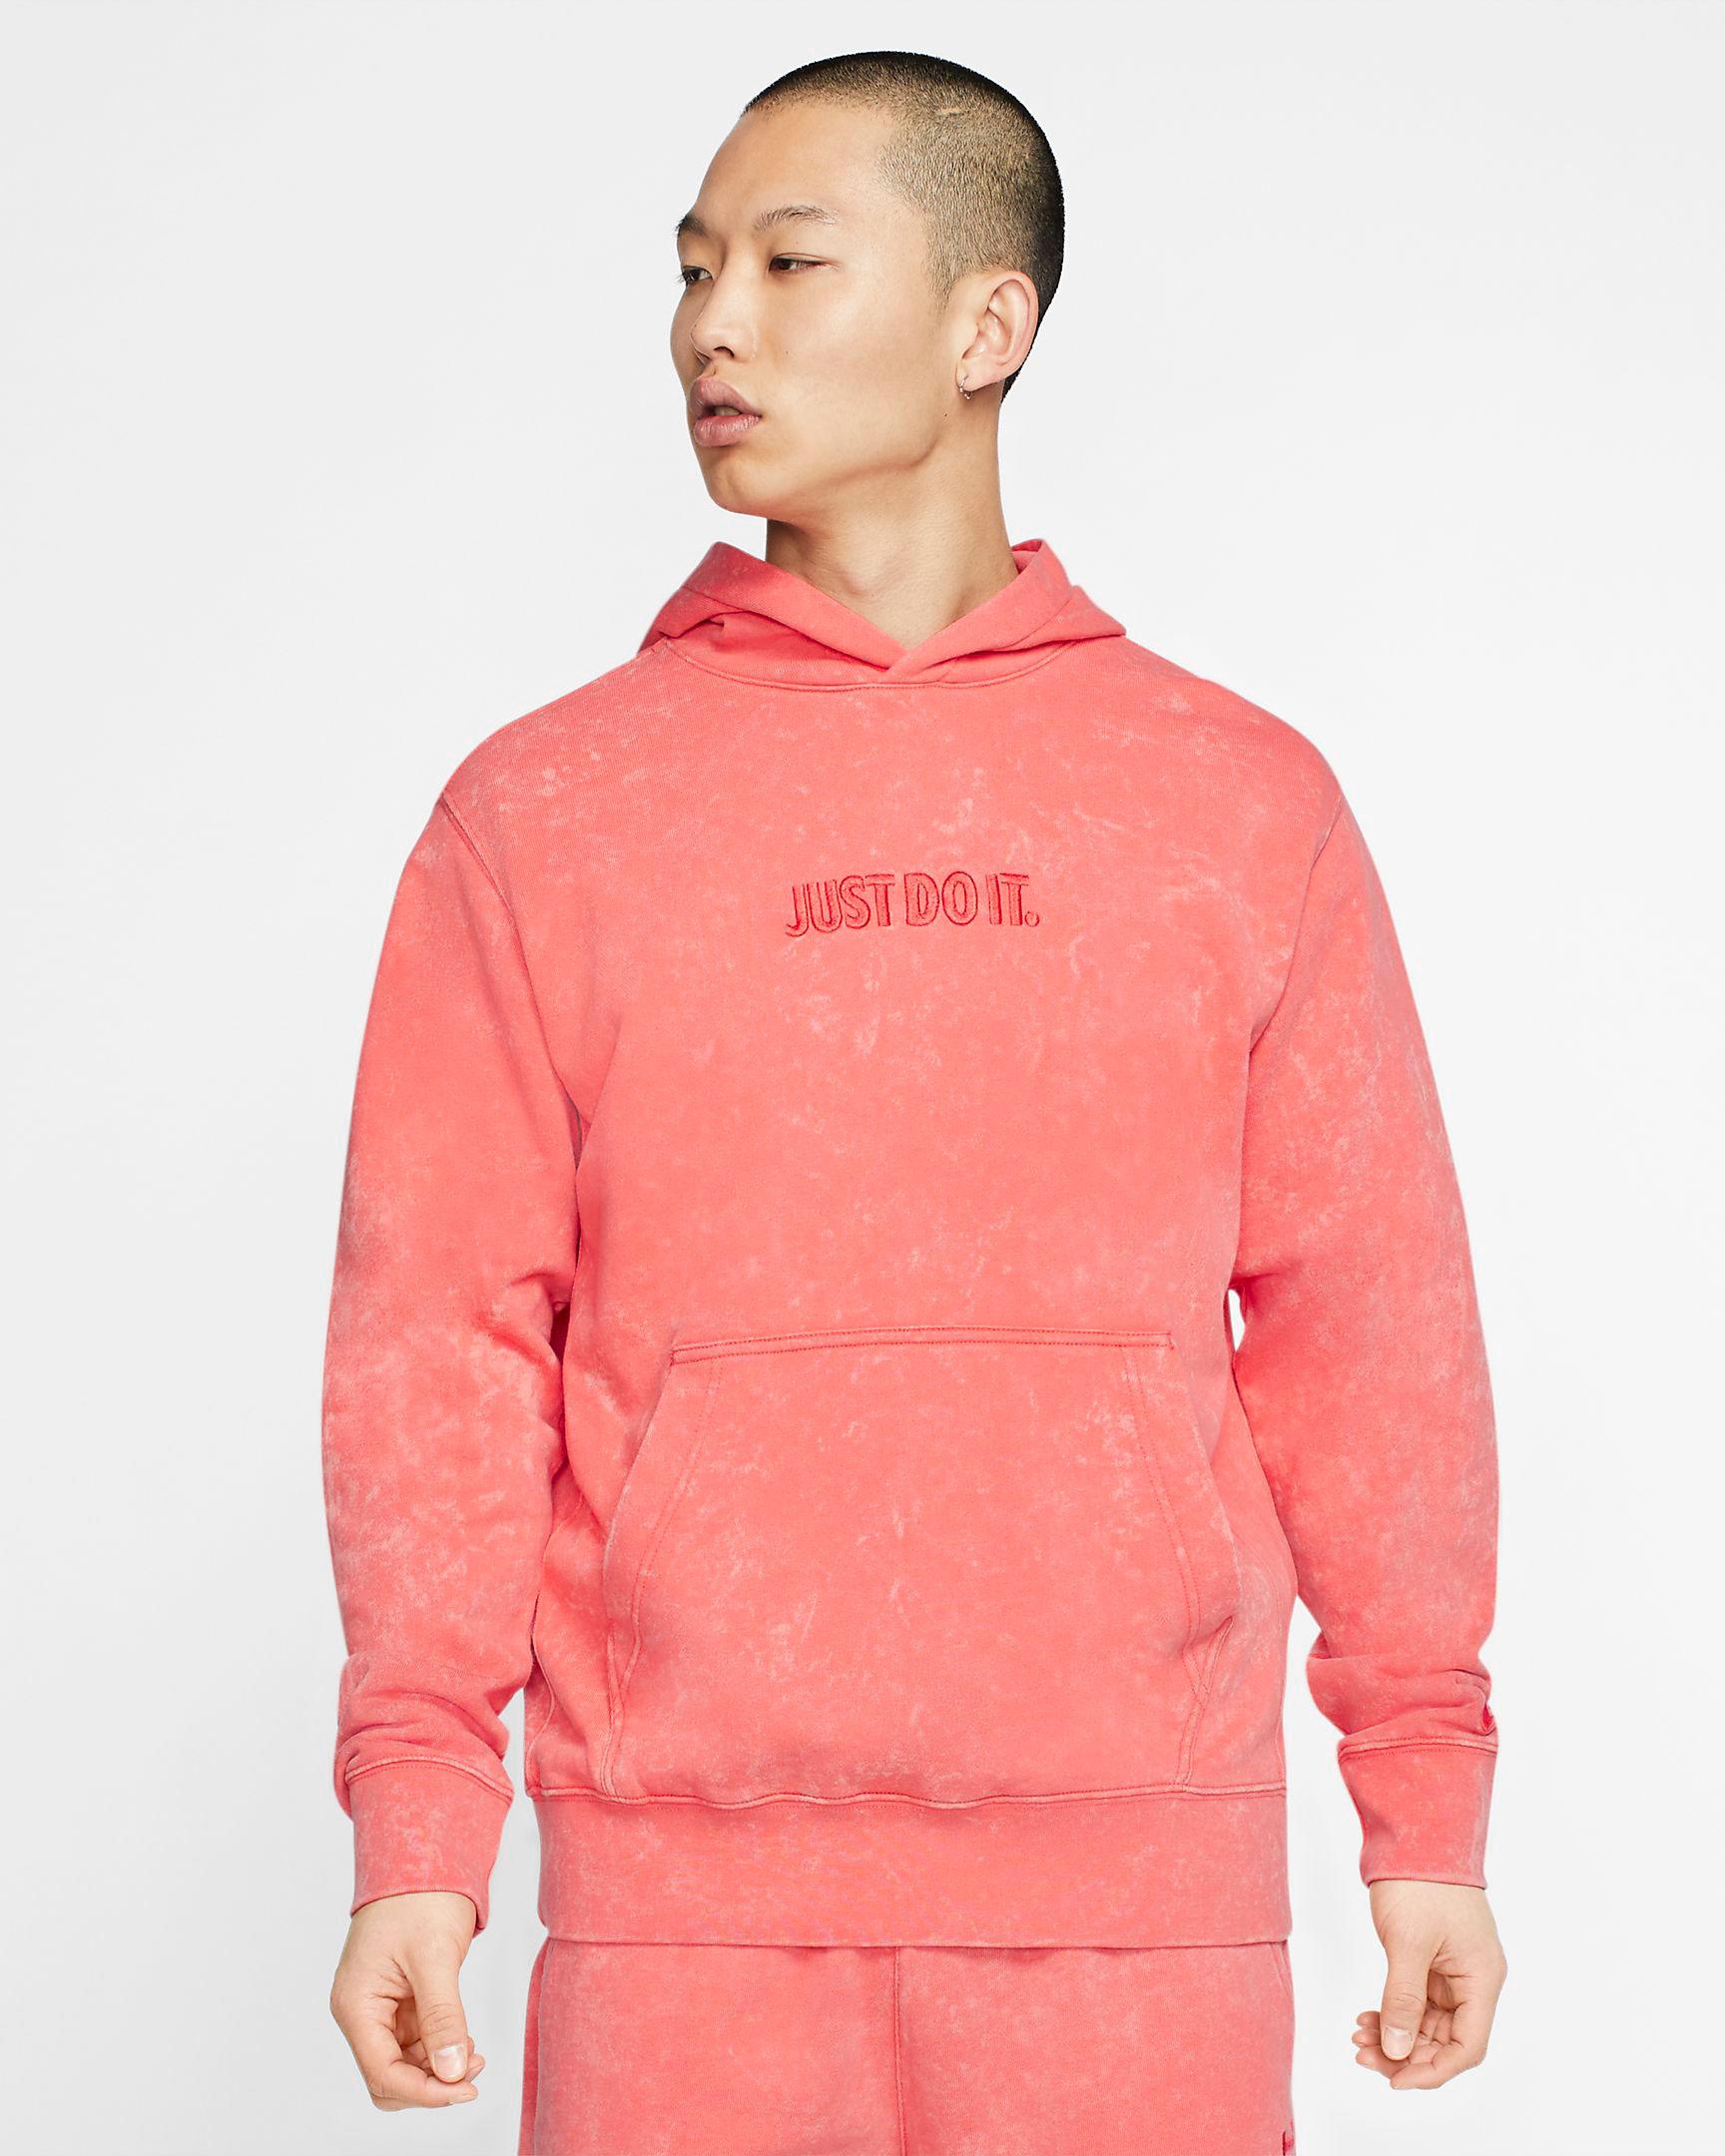 air-jordan-1-bio-hack-nike-pink-hoodie-match